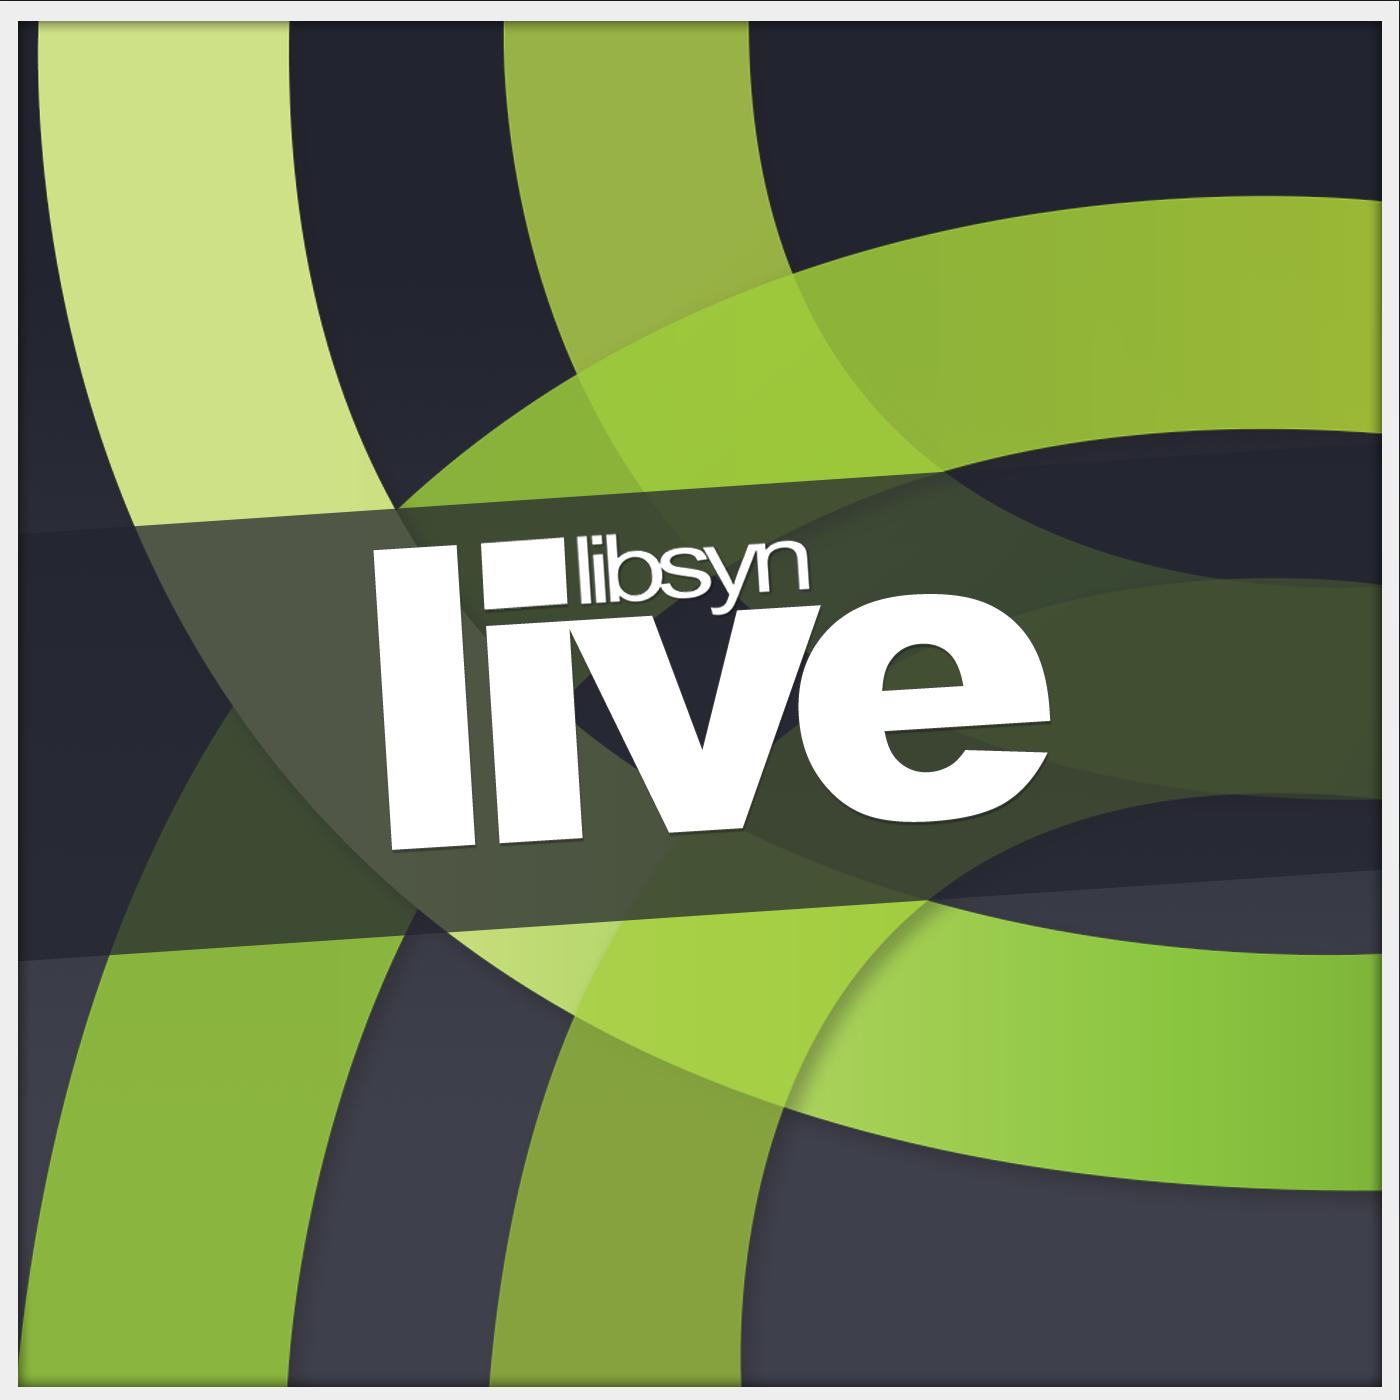 Libsyn Live (Video)